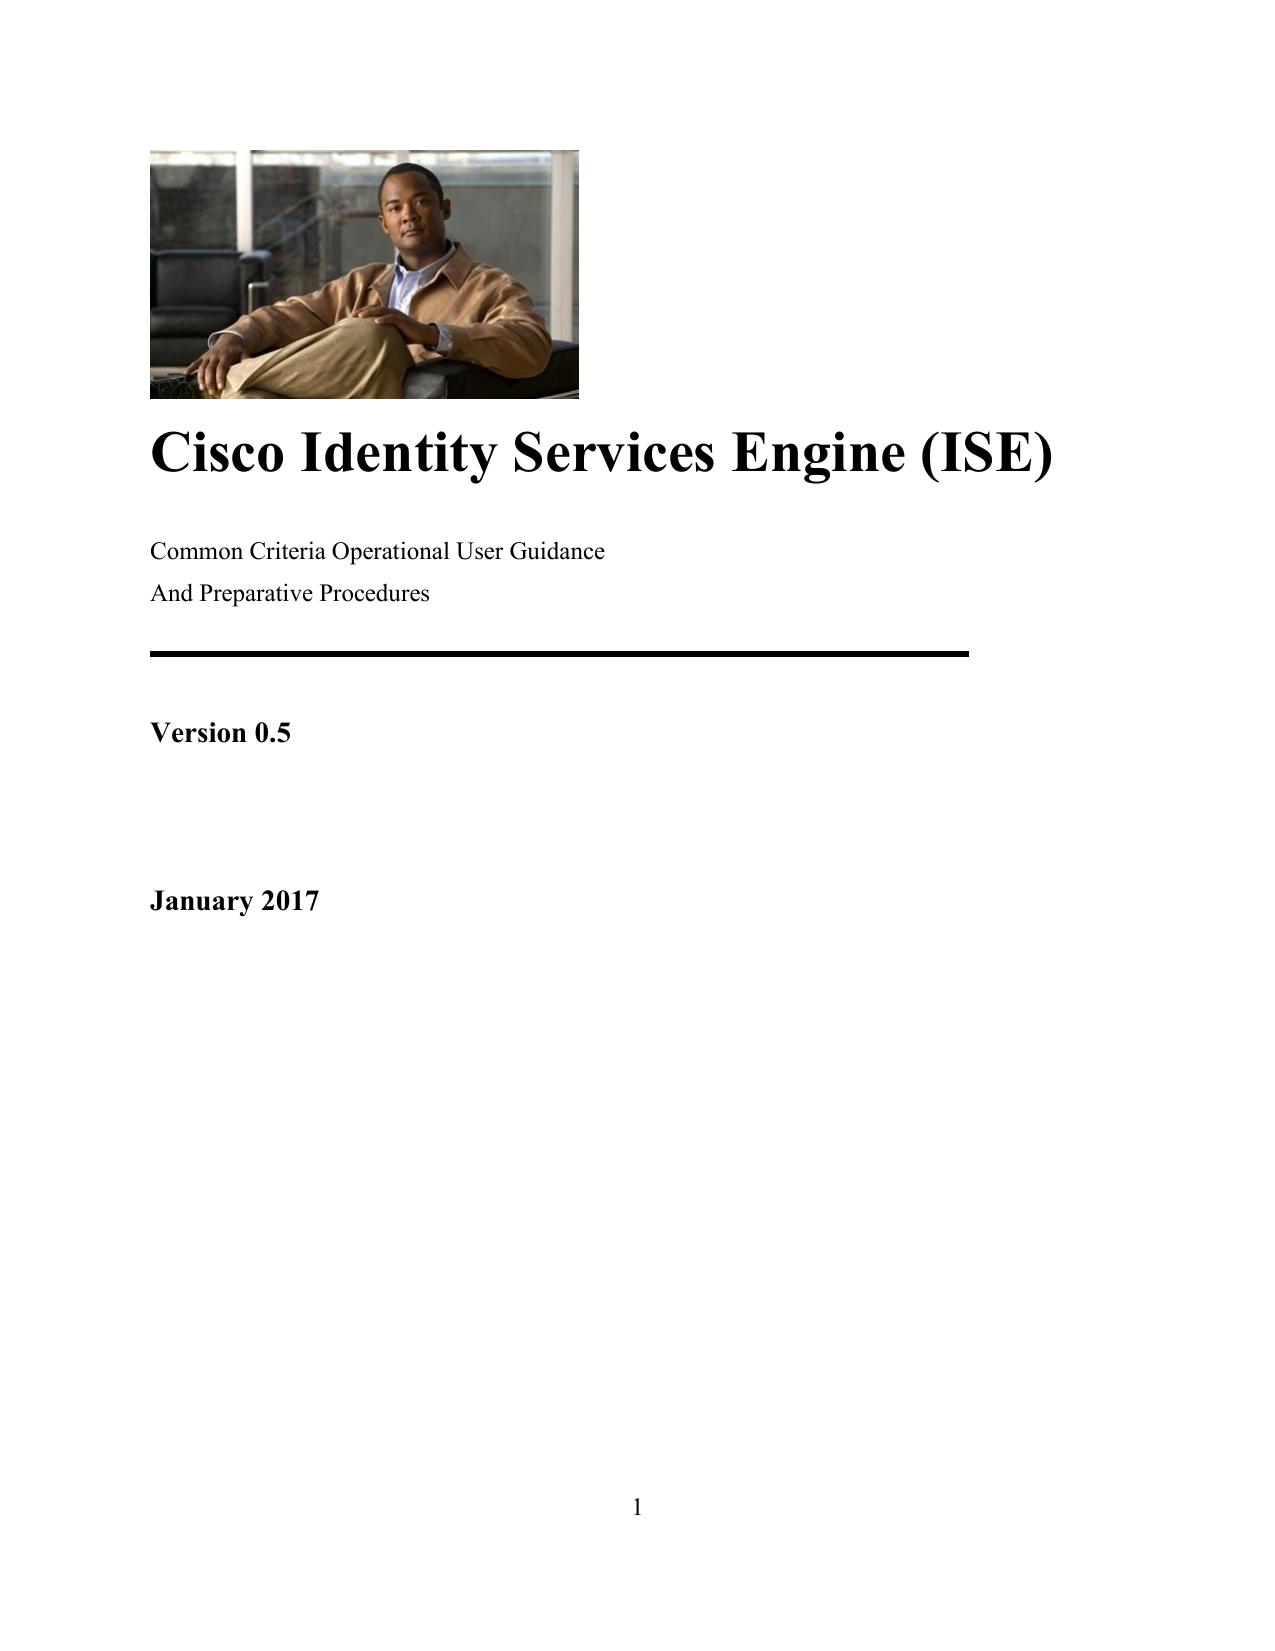 Cisco Identity Services Engine (ISE) | manualzz com